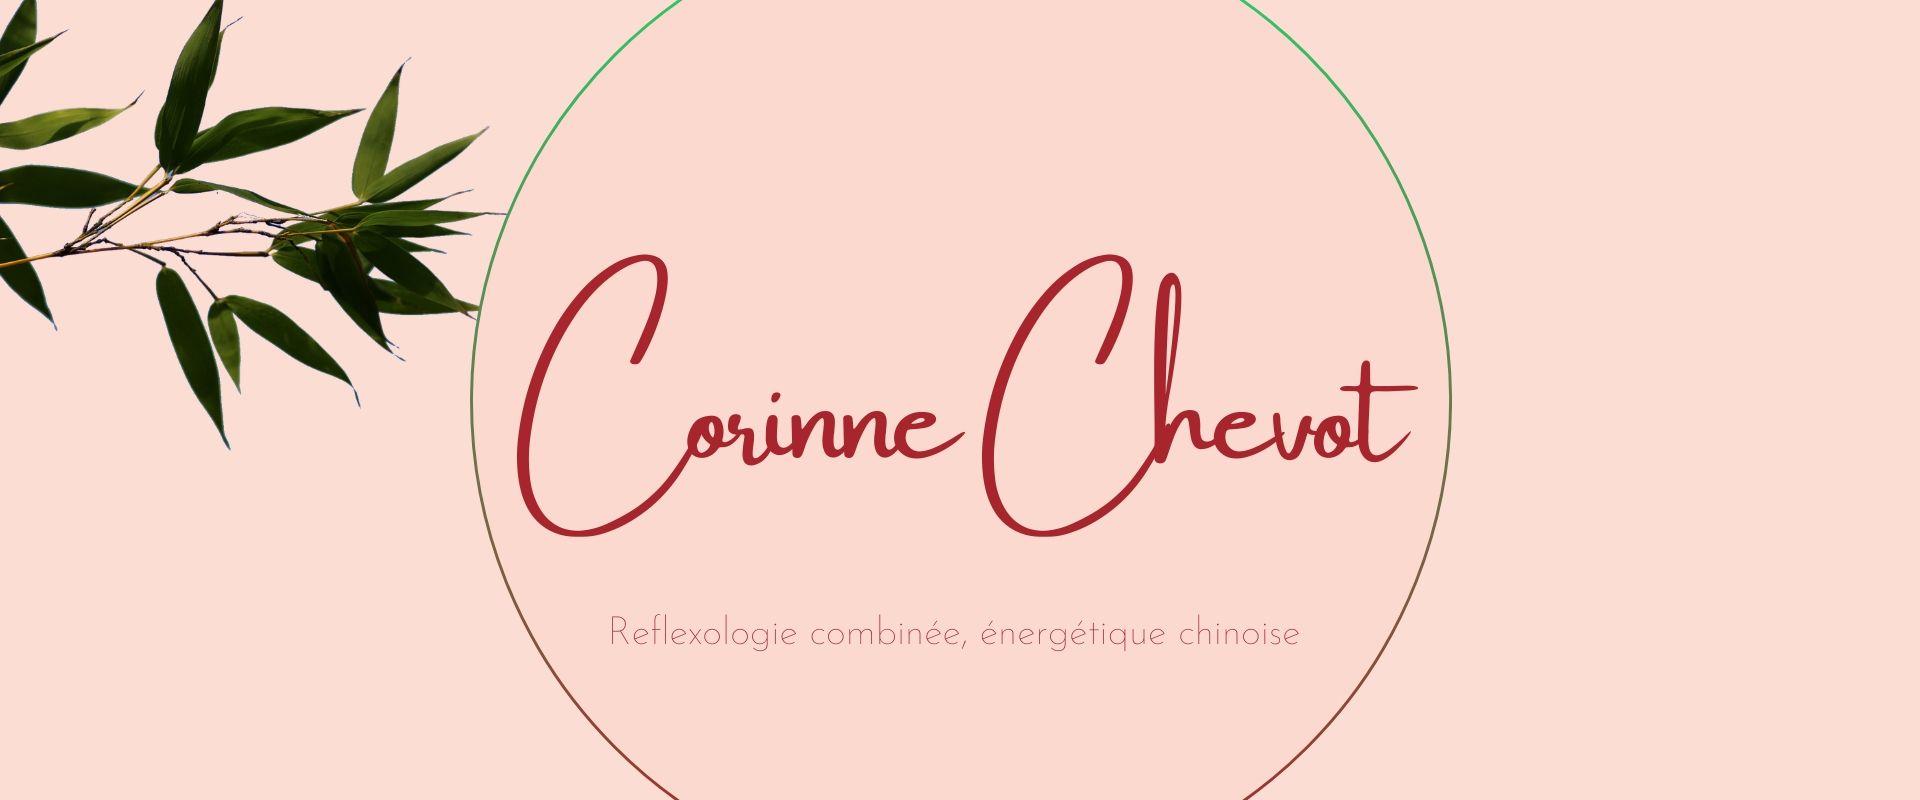 Corinne Chevot, cabinet à Nantes